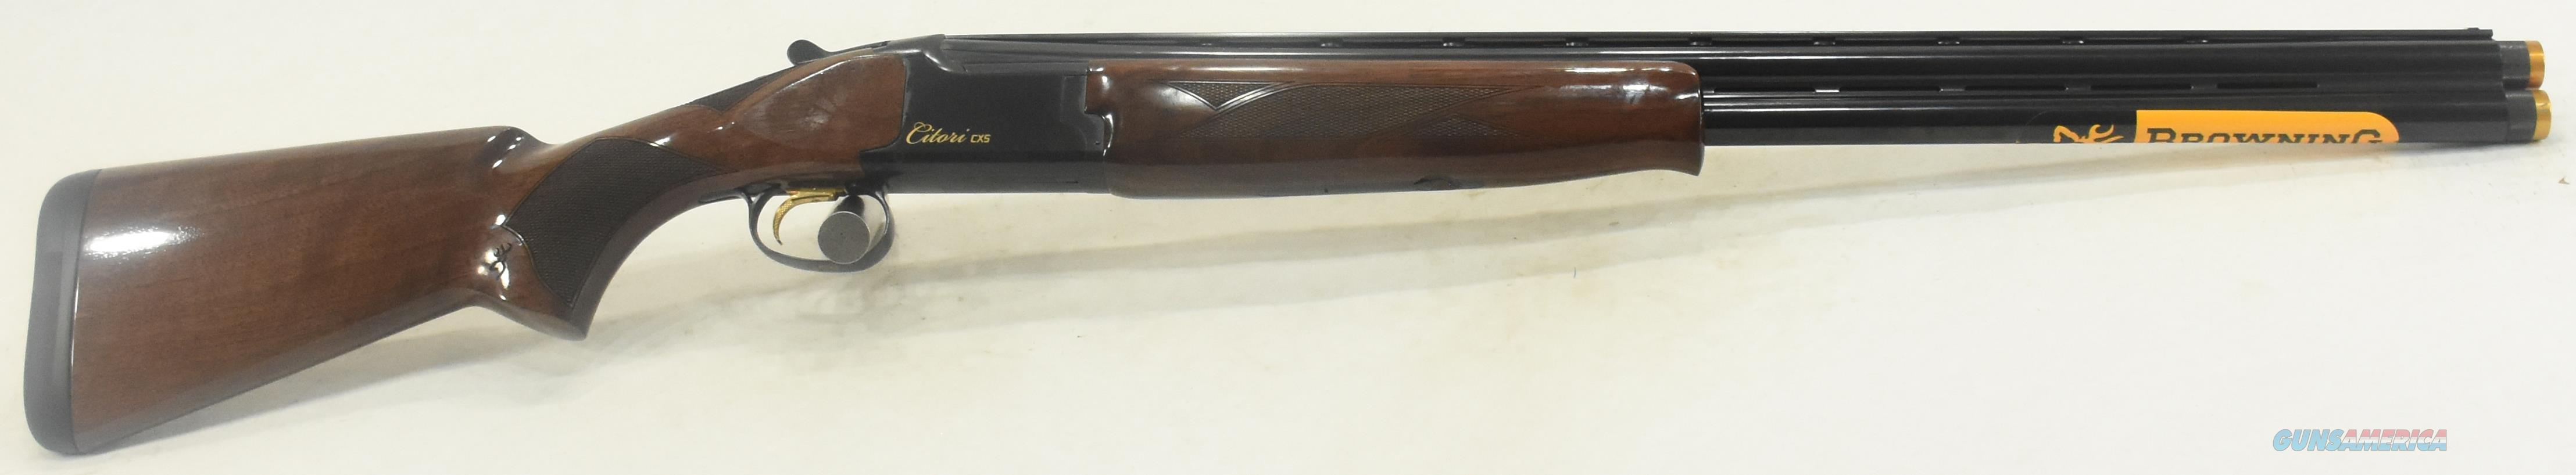 Citori CXS Micro Walnut 12Ga 26-3In 018140305  Guns > Shotguns > Browning Shotguns > Over Unders > Citori > Hunting